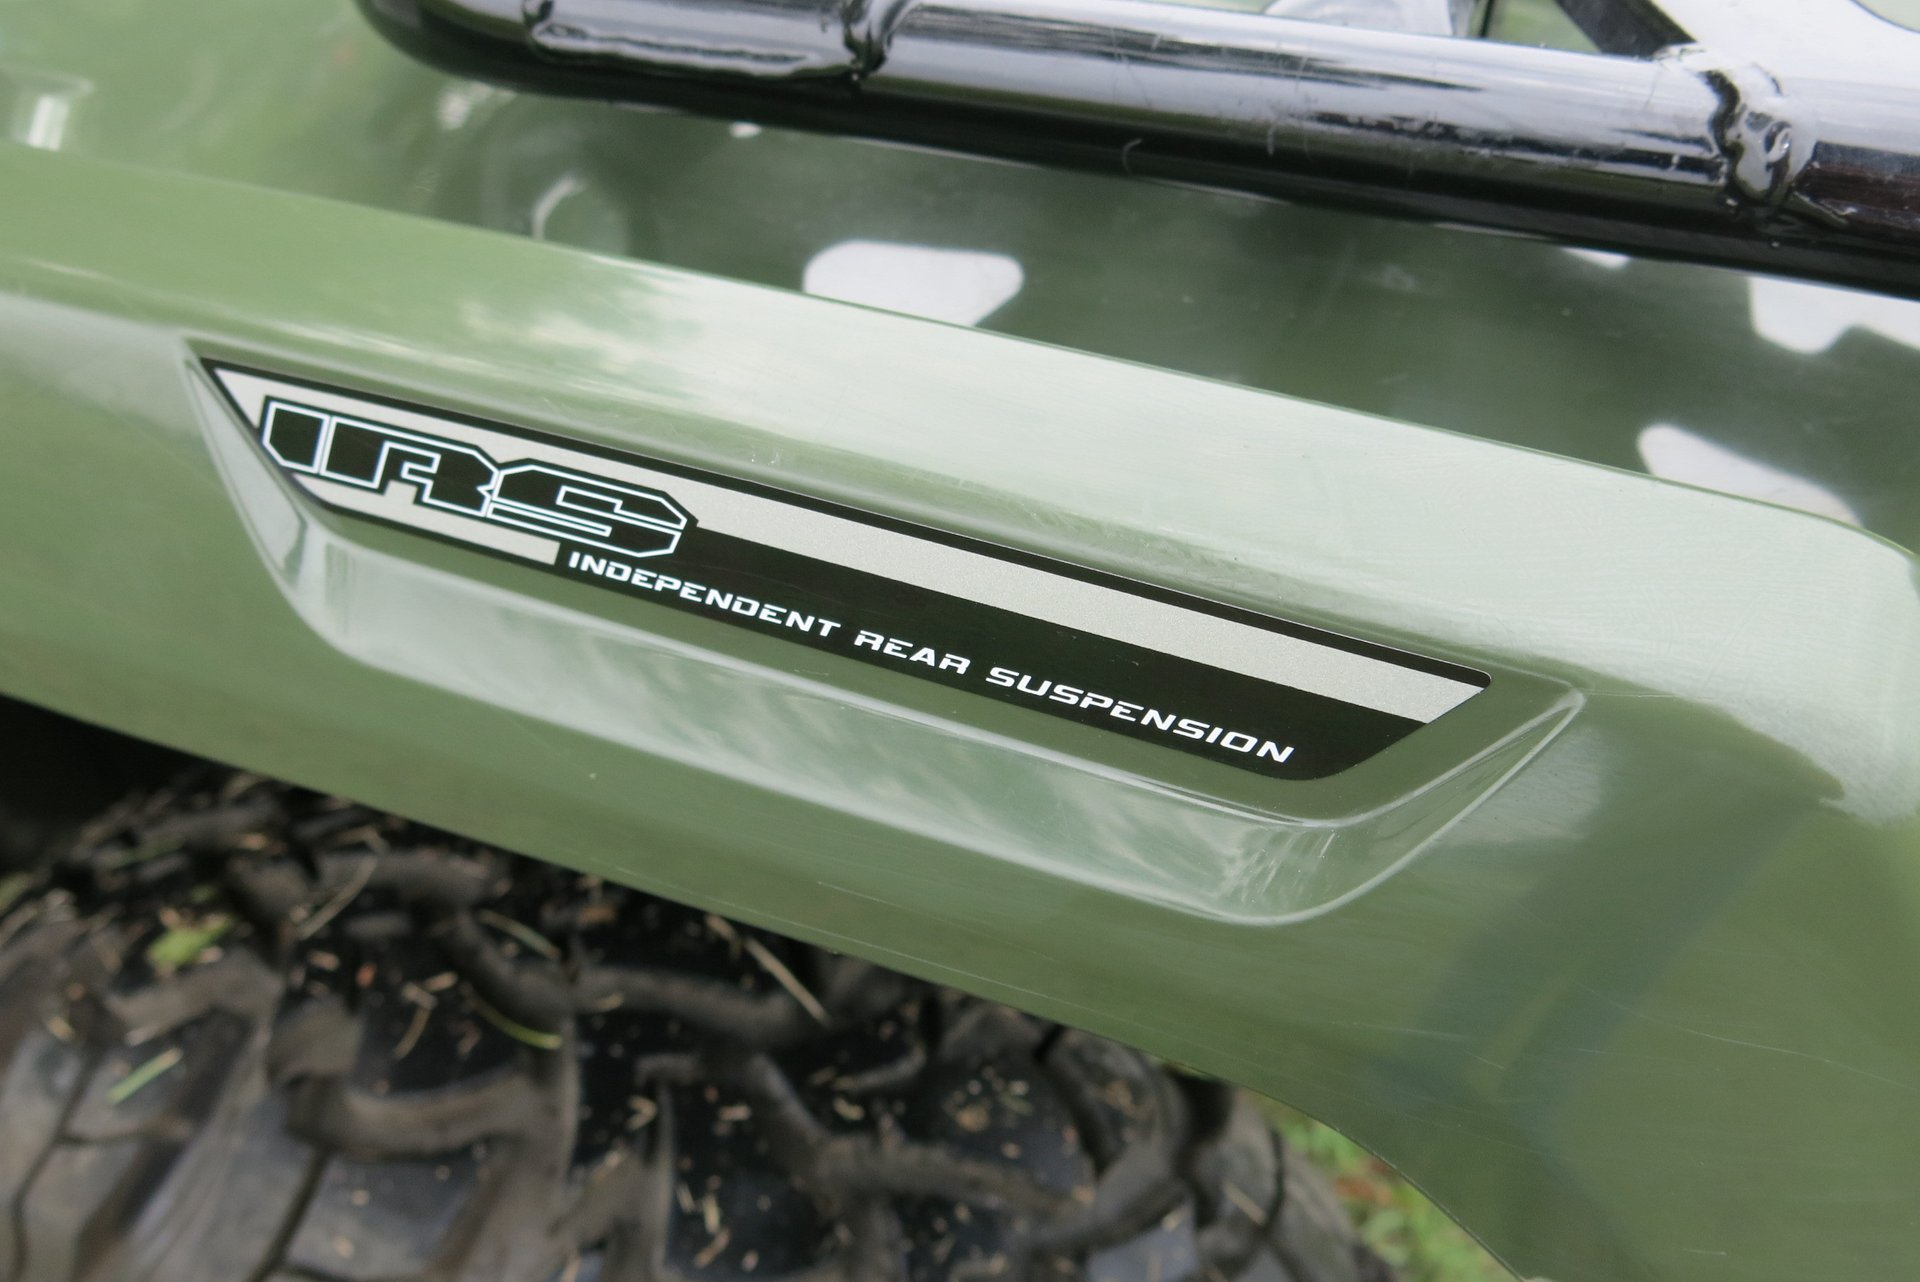 2015 Honda Foreman Rubicon trx500 for sale #98882 | MCG